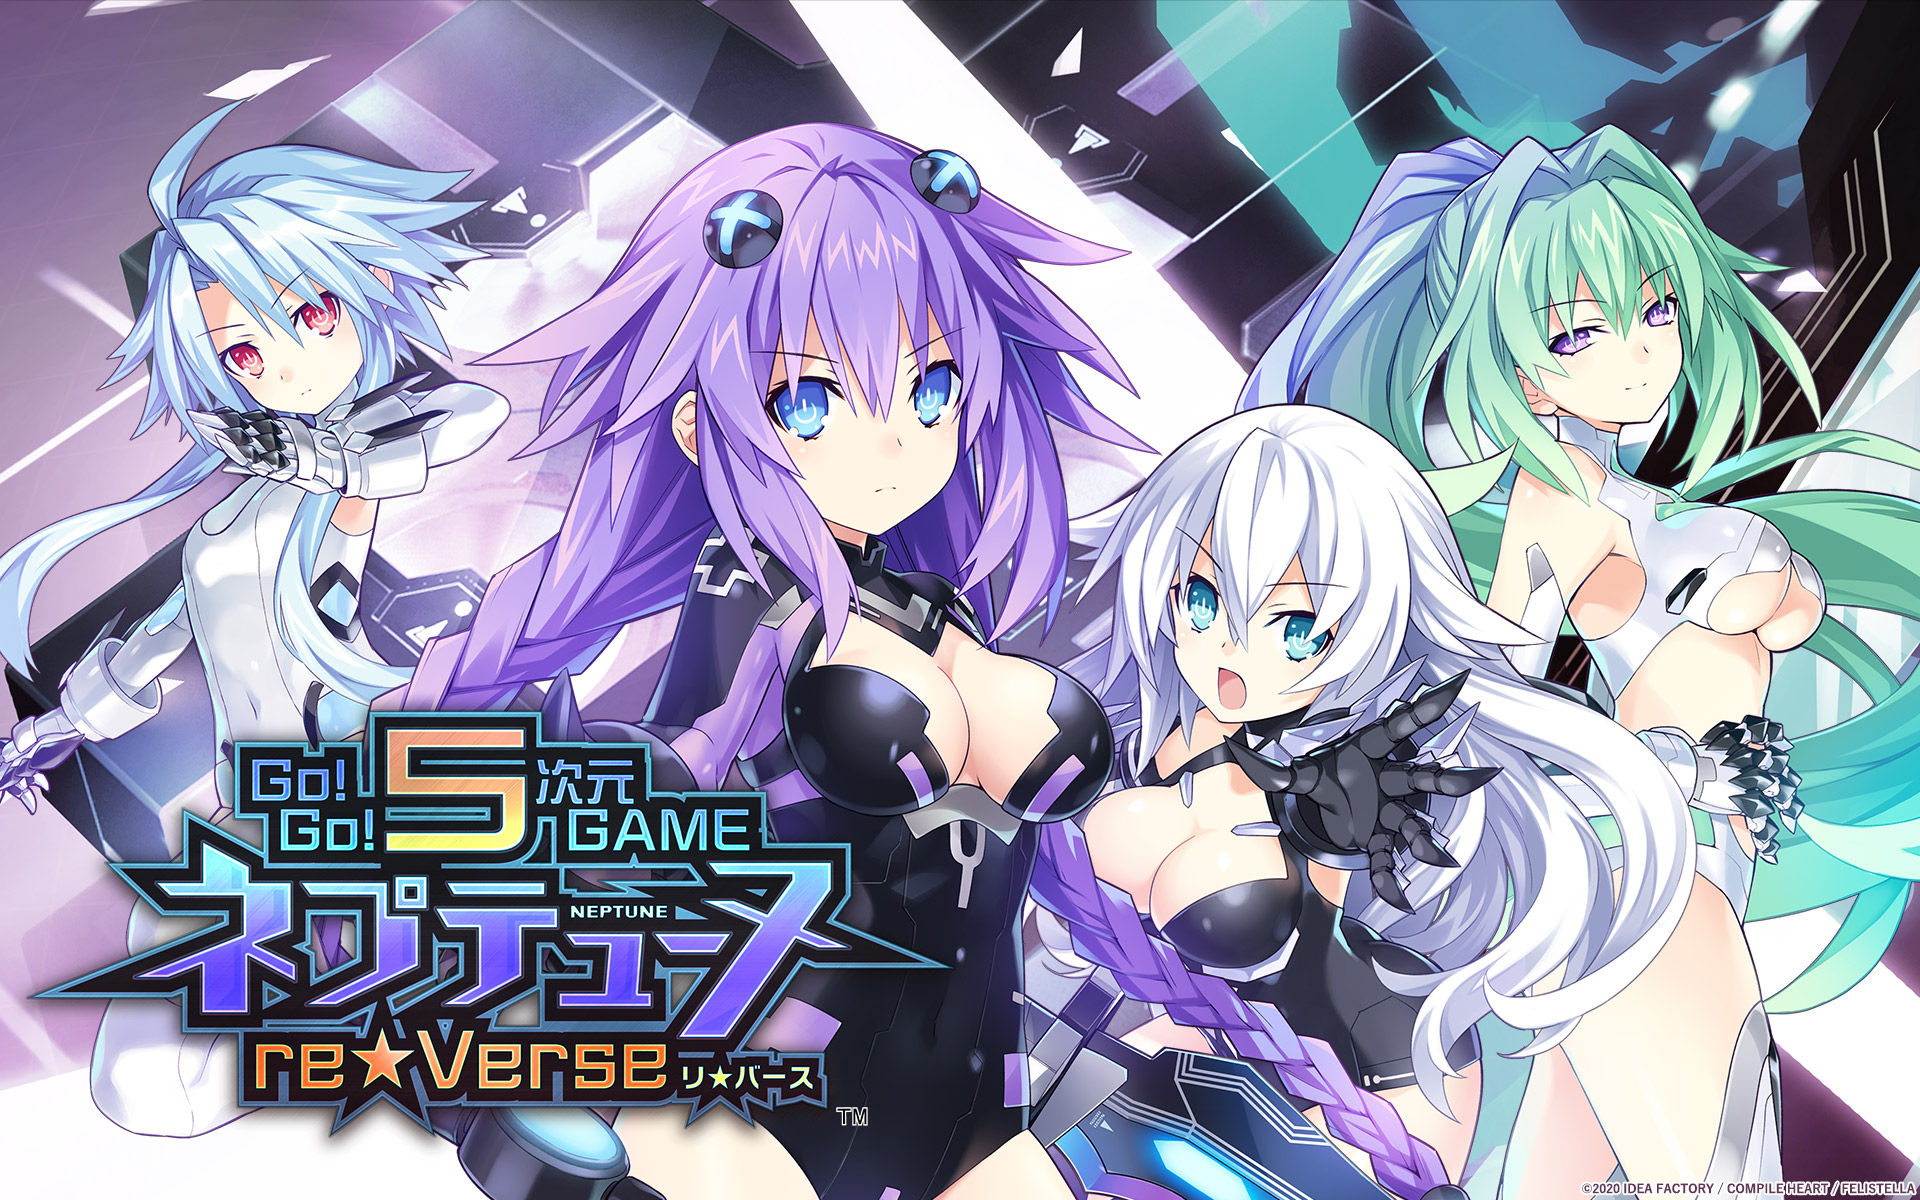 《Go!Go!5次元游戏海王星re★Verse》新图:更多服饰